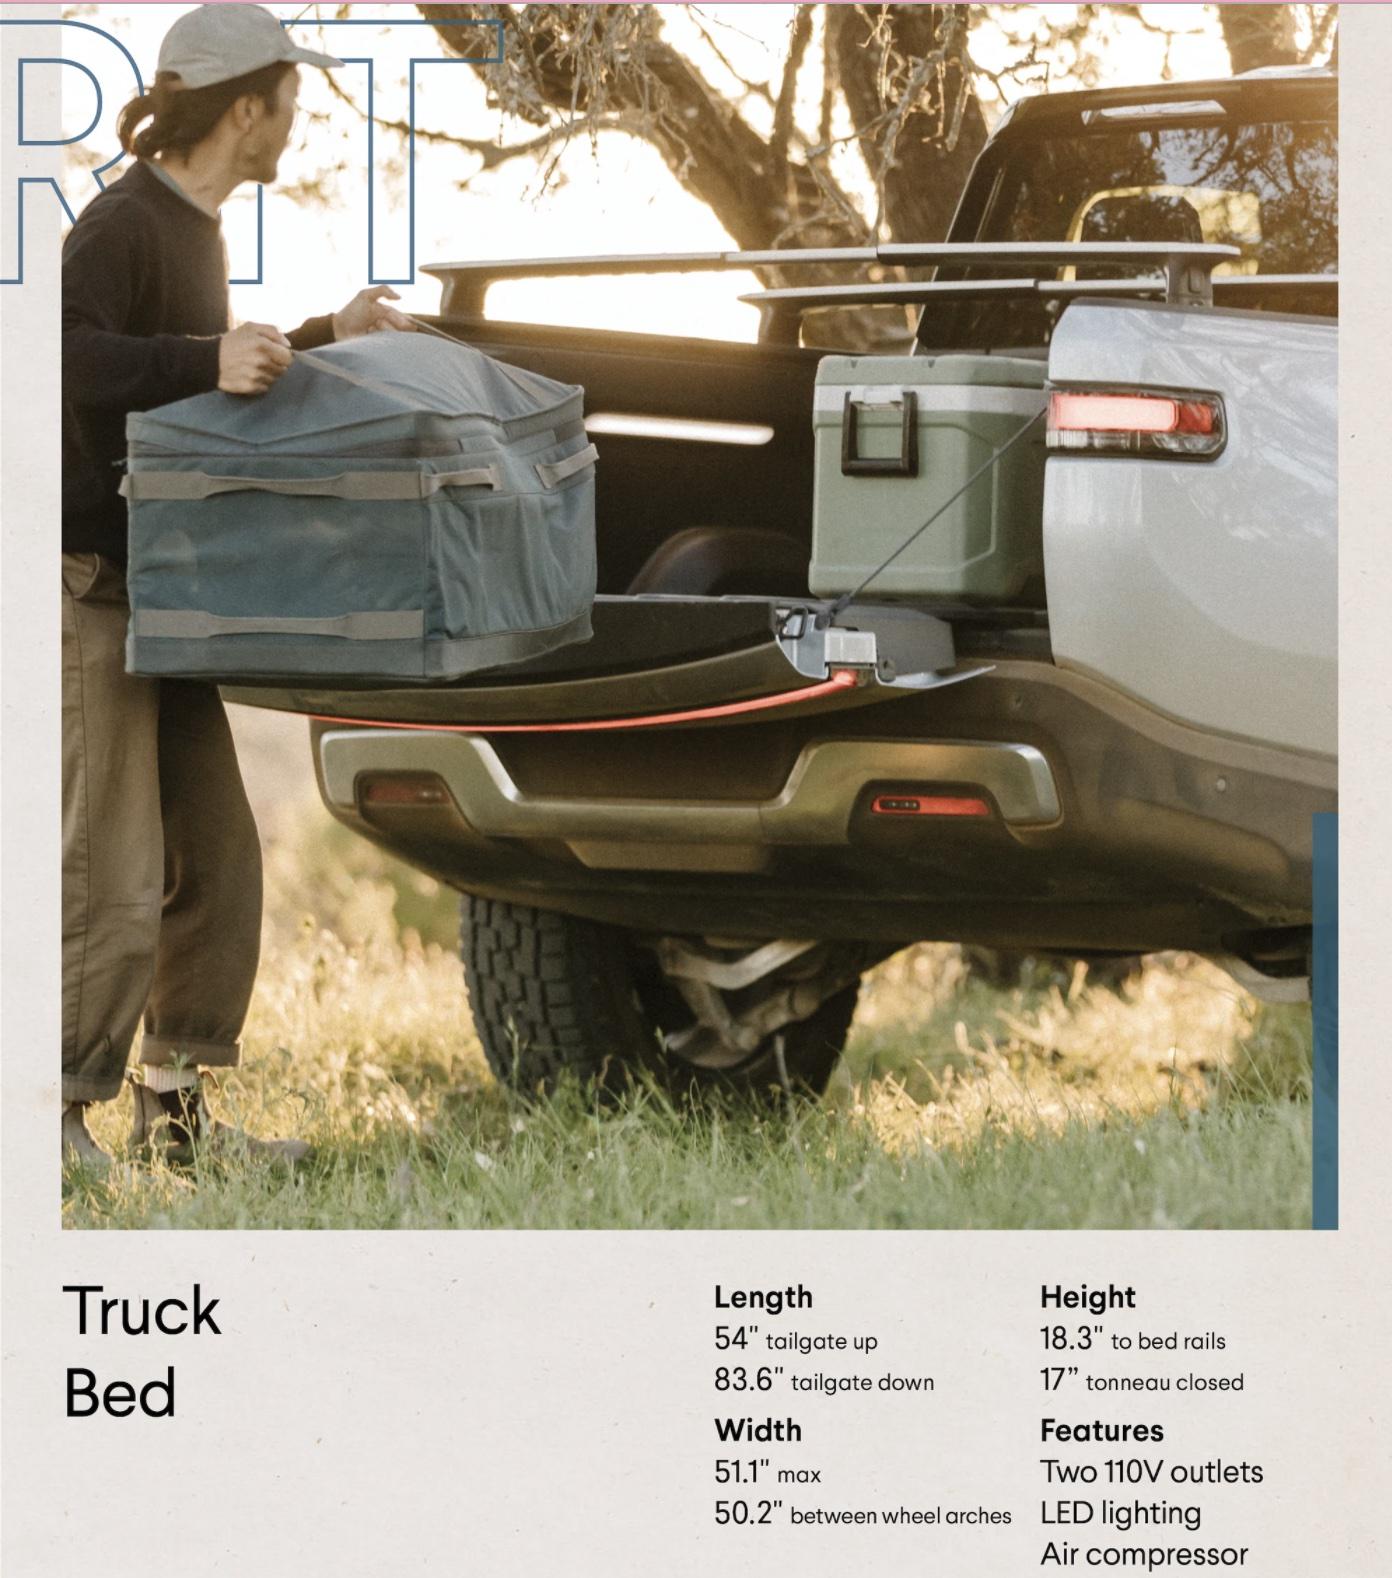 rivian-r1t-truck-bed-dimensions